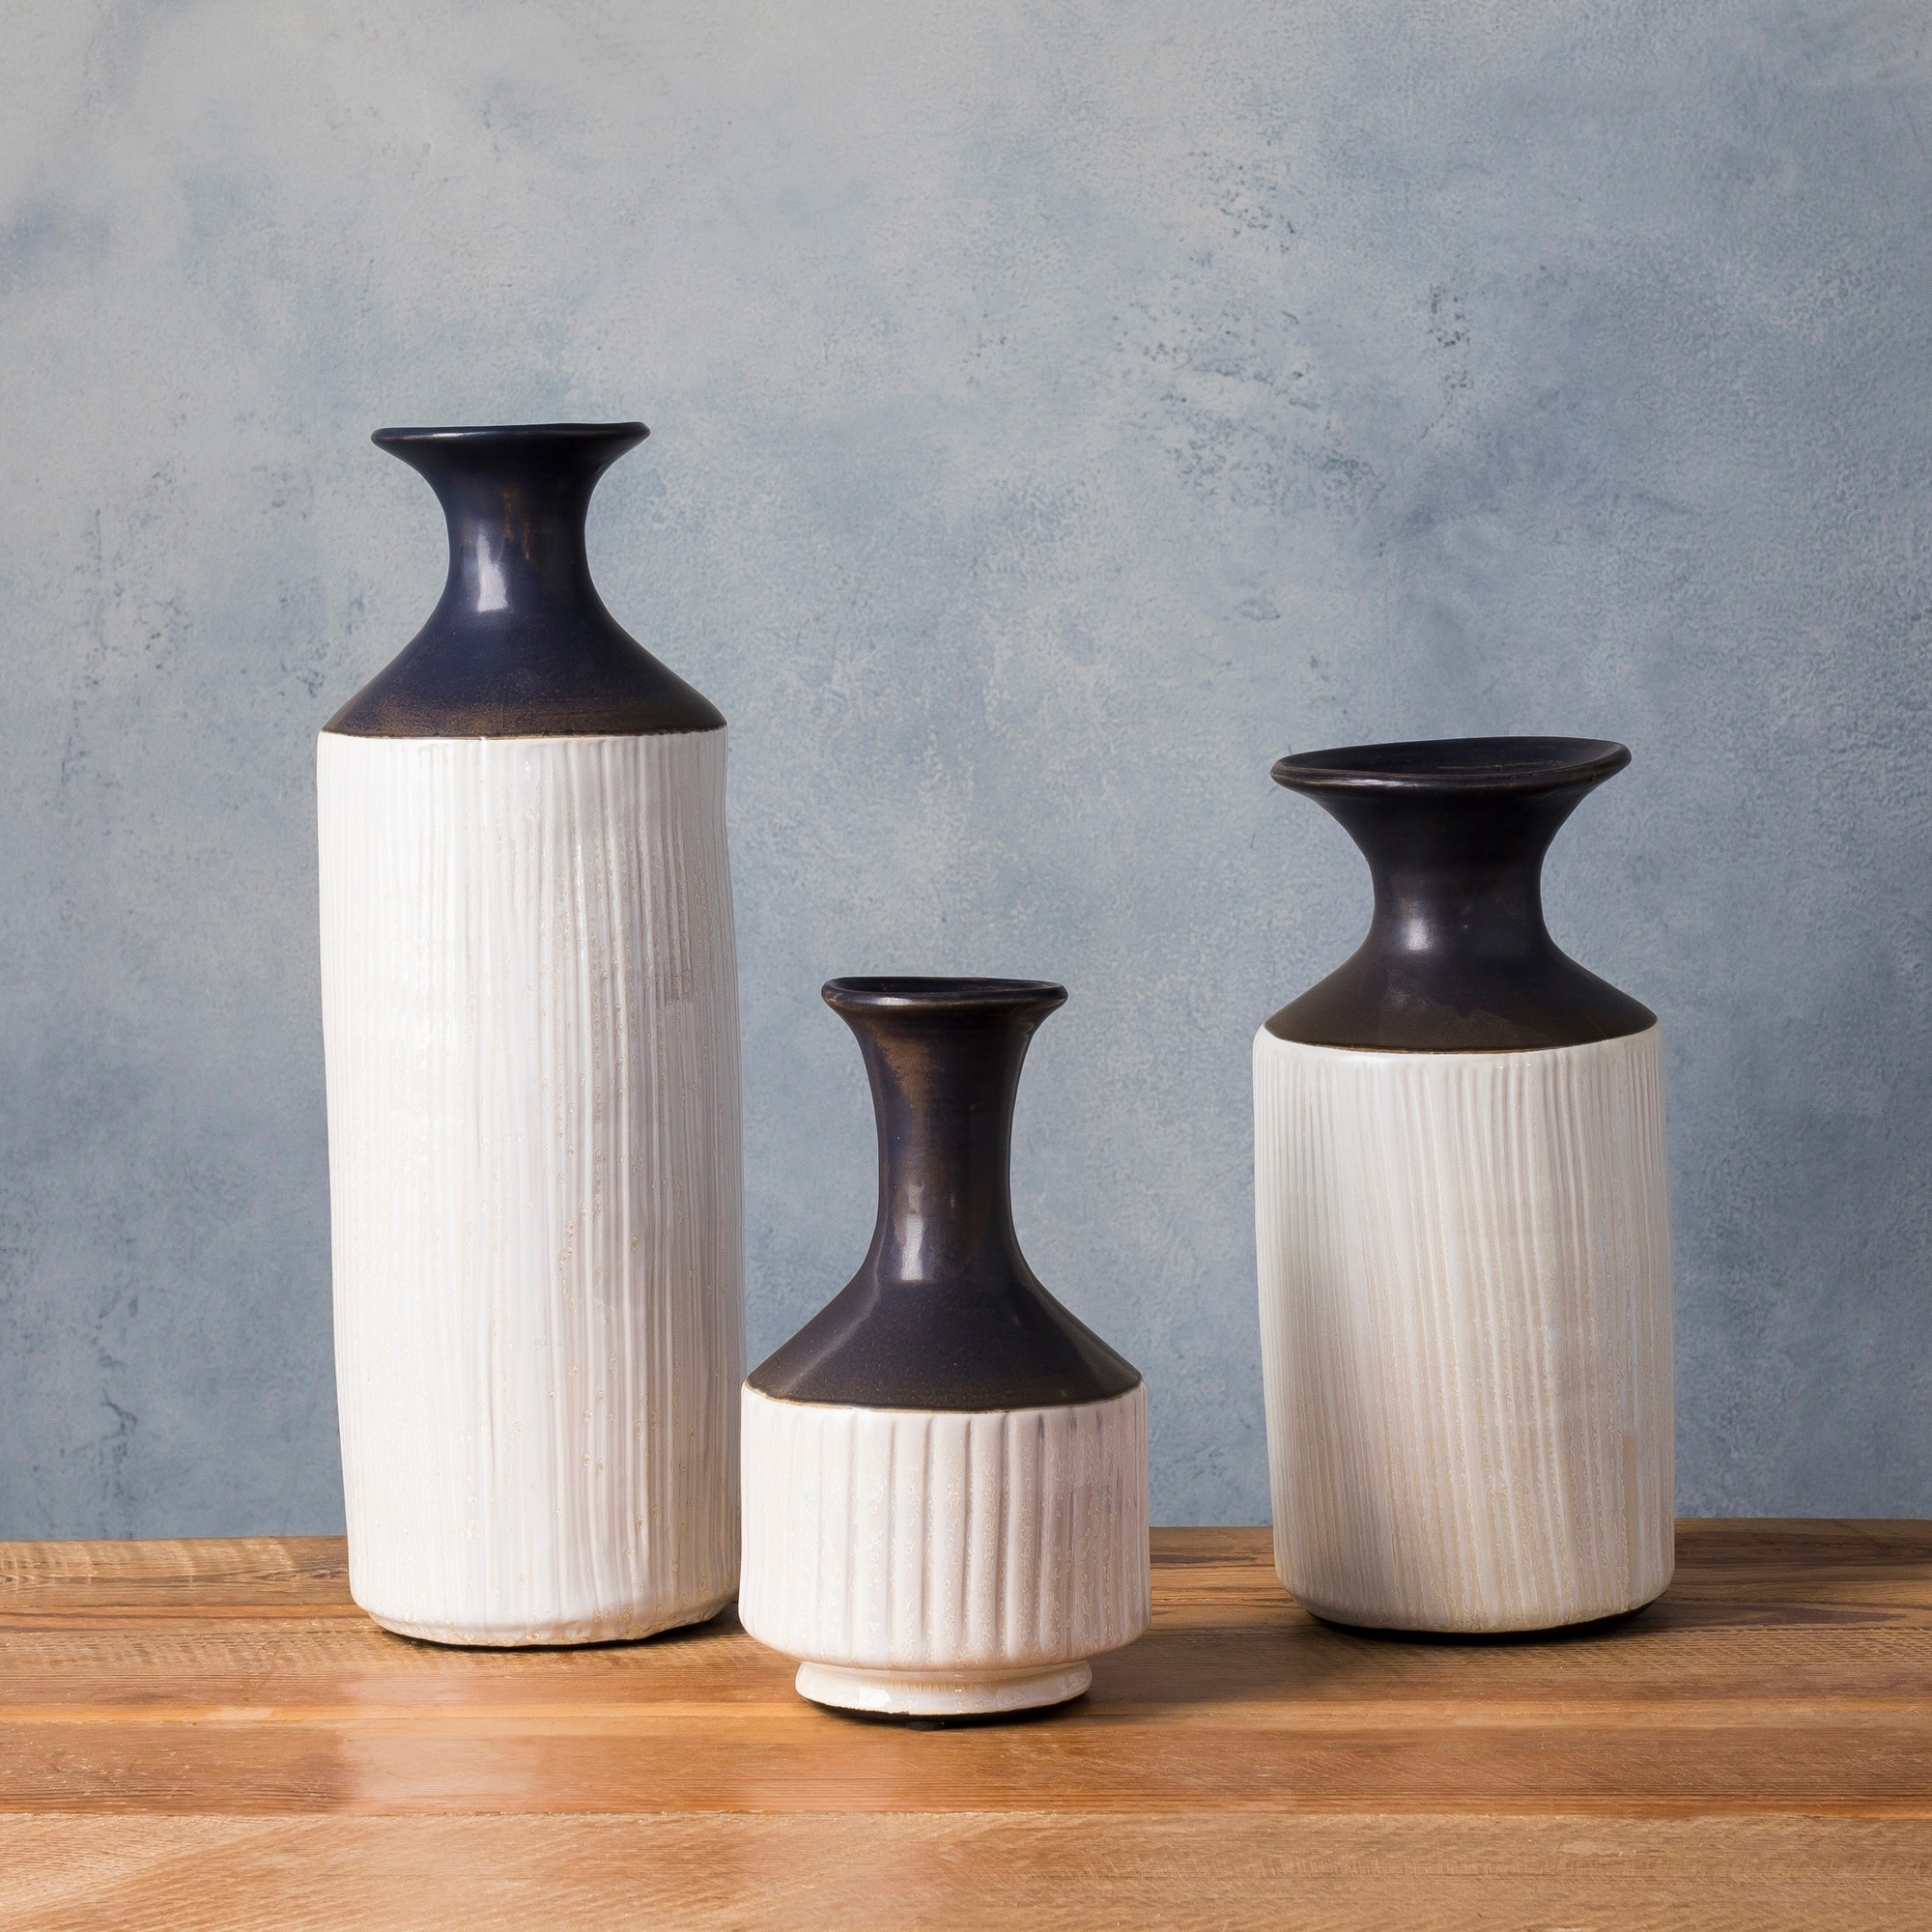 Albescu navy ceramic modern decorative vase set of 3 free albescu navy ceramic modern decorative vase set of 3 free shipping today overstock 24367661 reviewsmspy